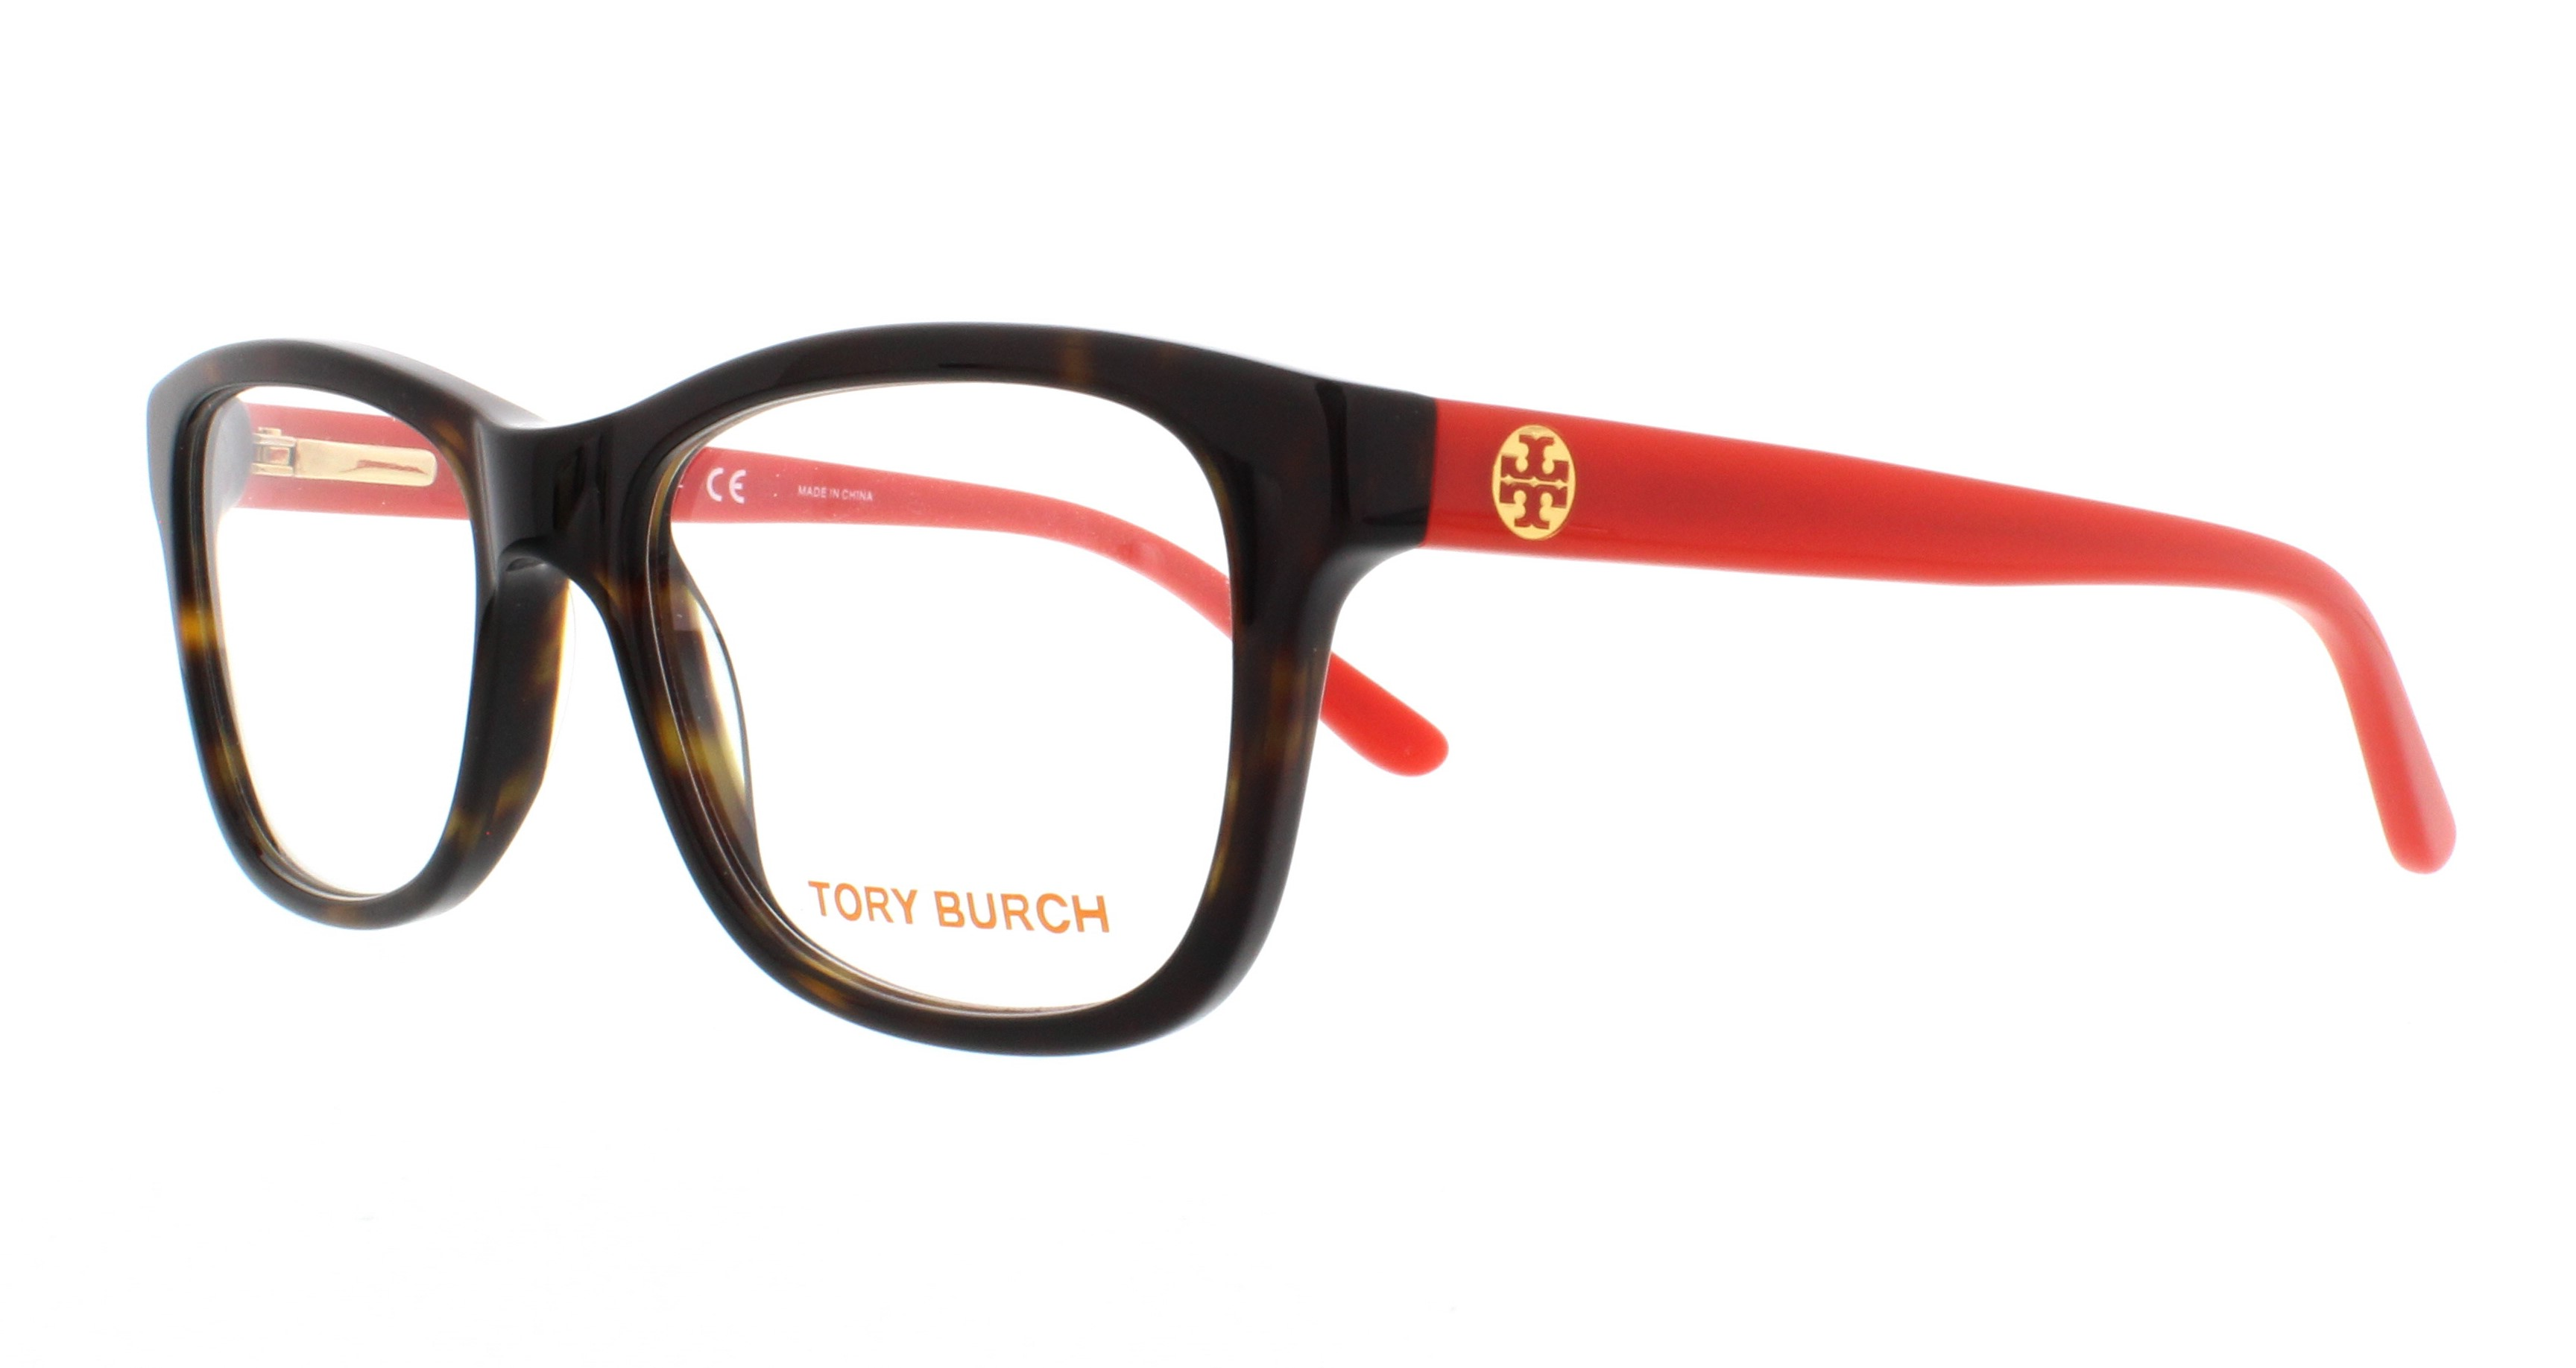 c300477fa4 Designer Frames Outlet. Tory Burch TY2038